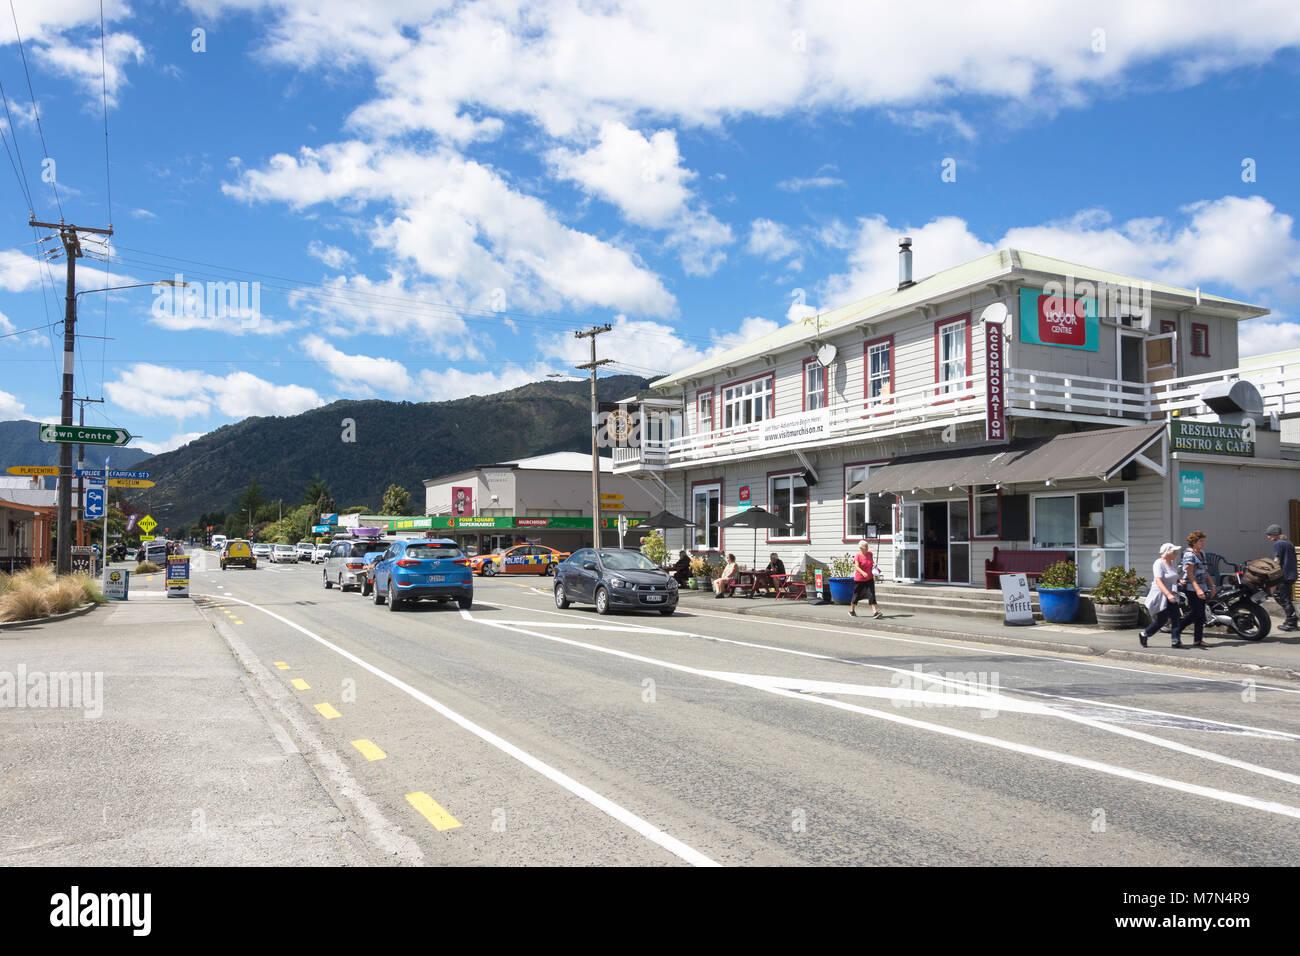 Waller Street (State Highway 6), Murchison, Tasman Region, New Zealand - Stock Image